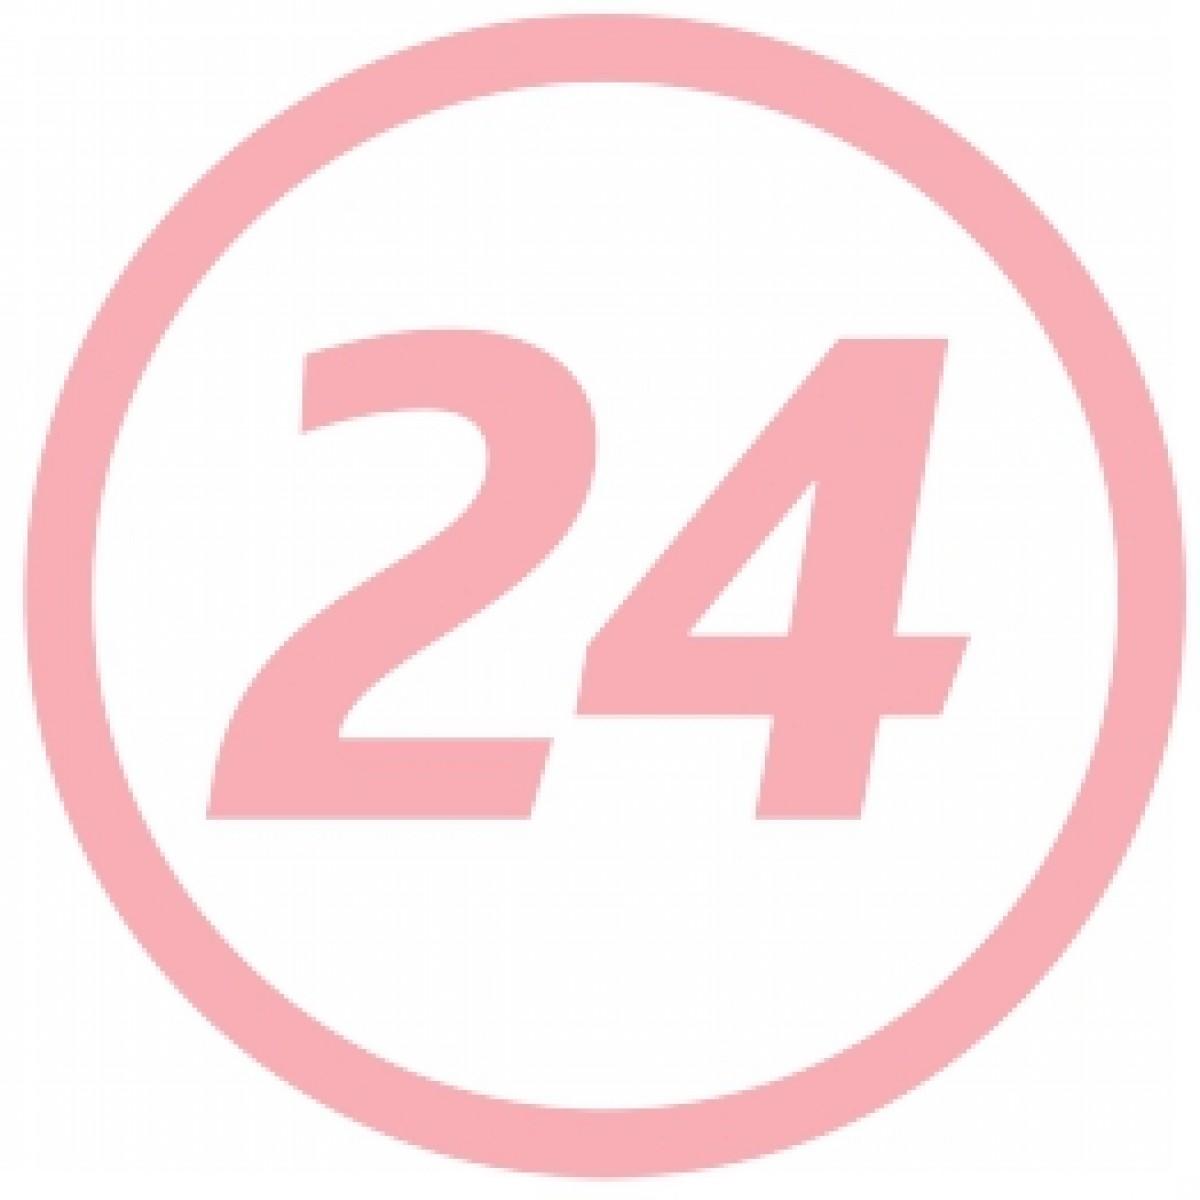 Antiflebitic MK Crema,  Crema, 35g